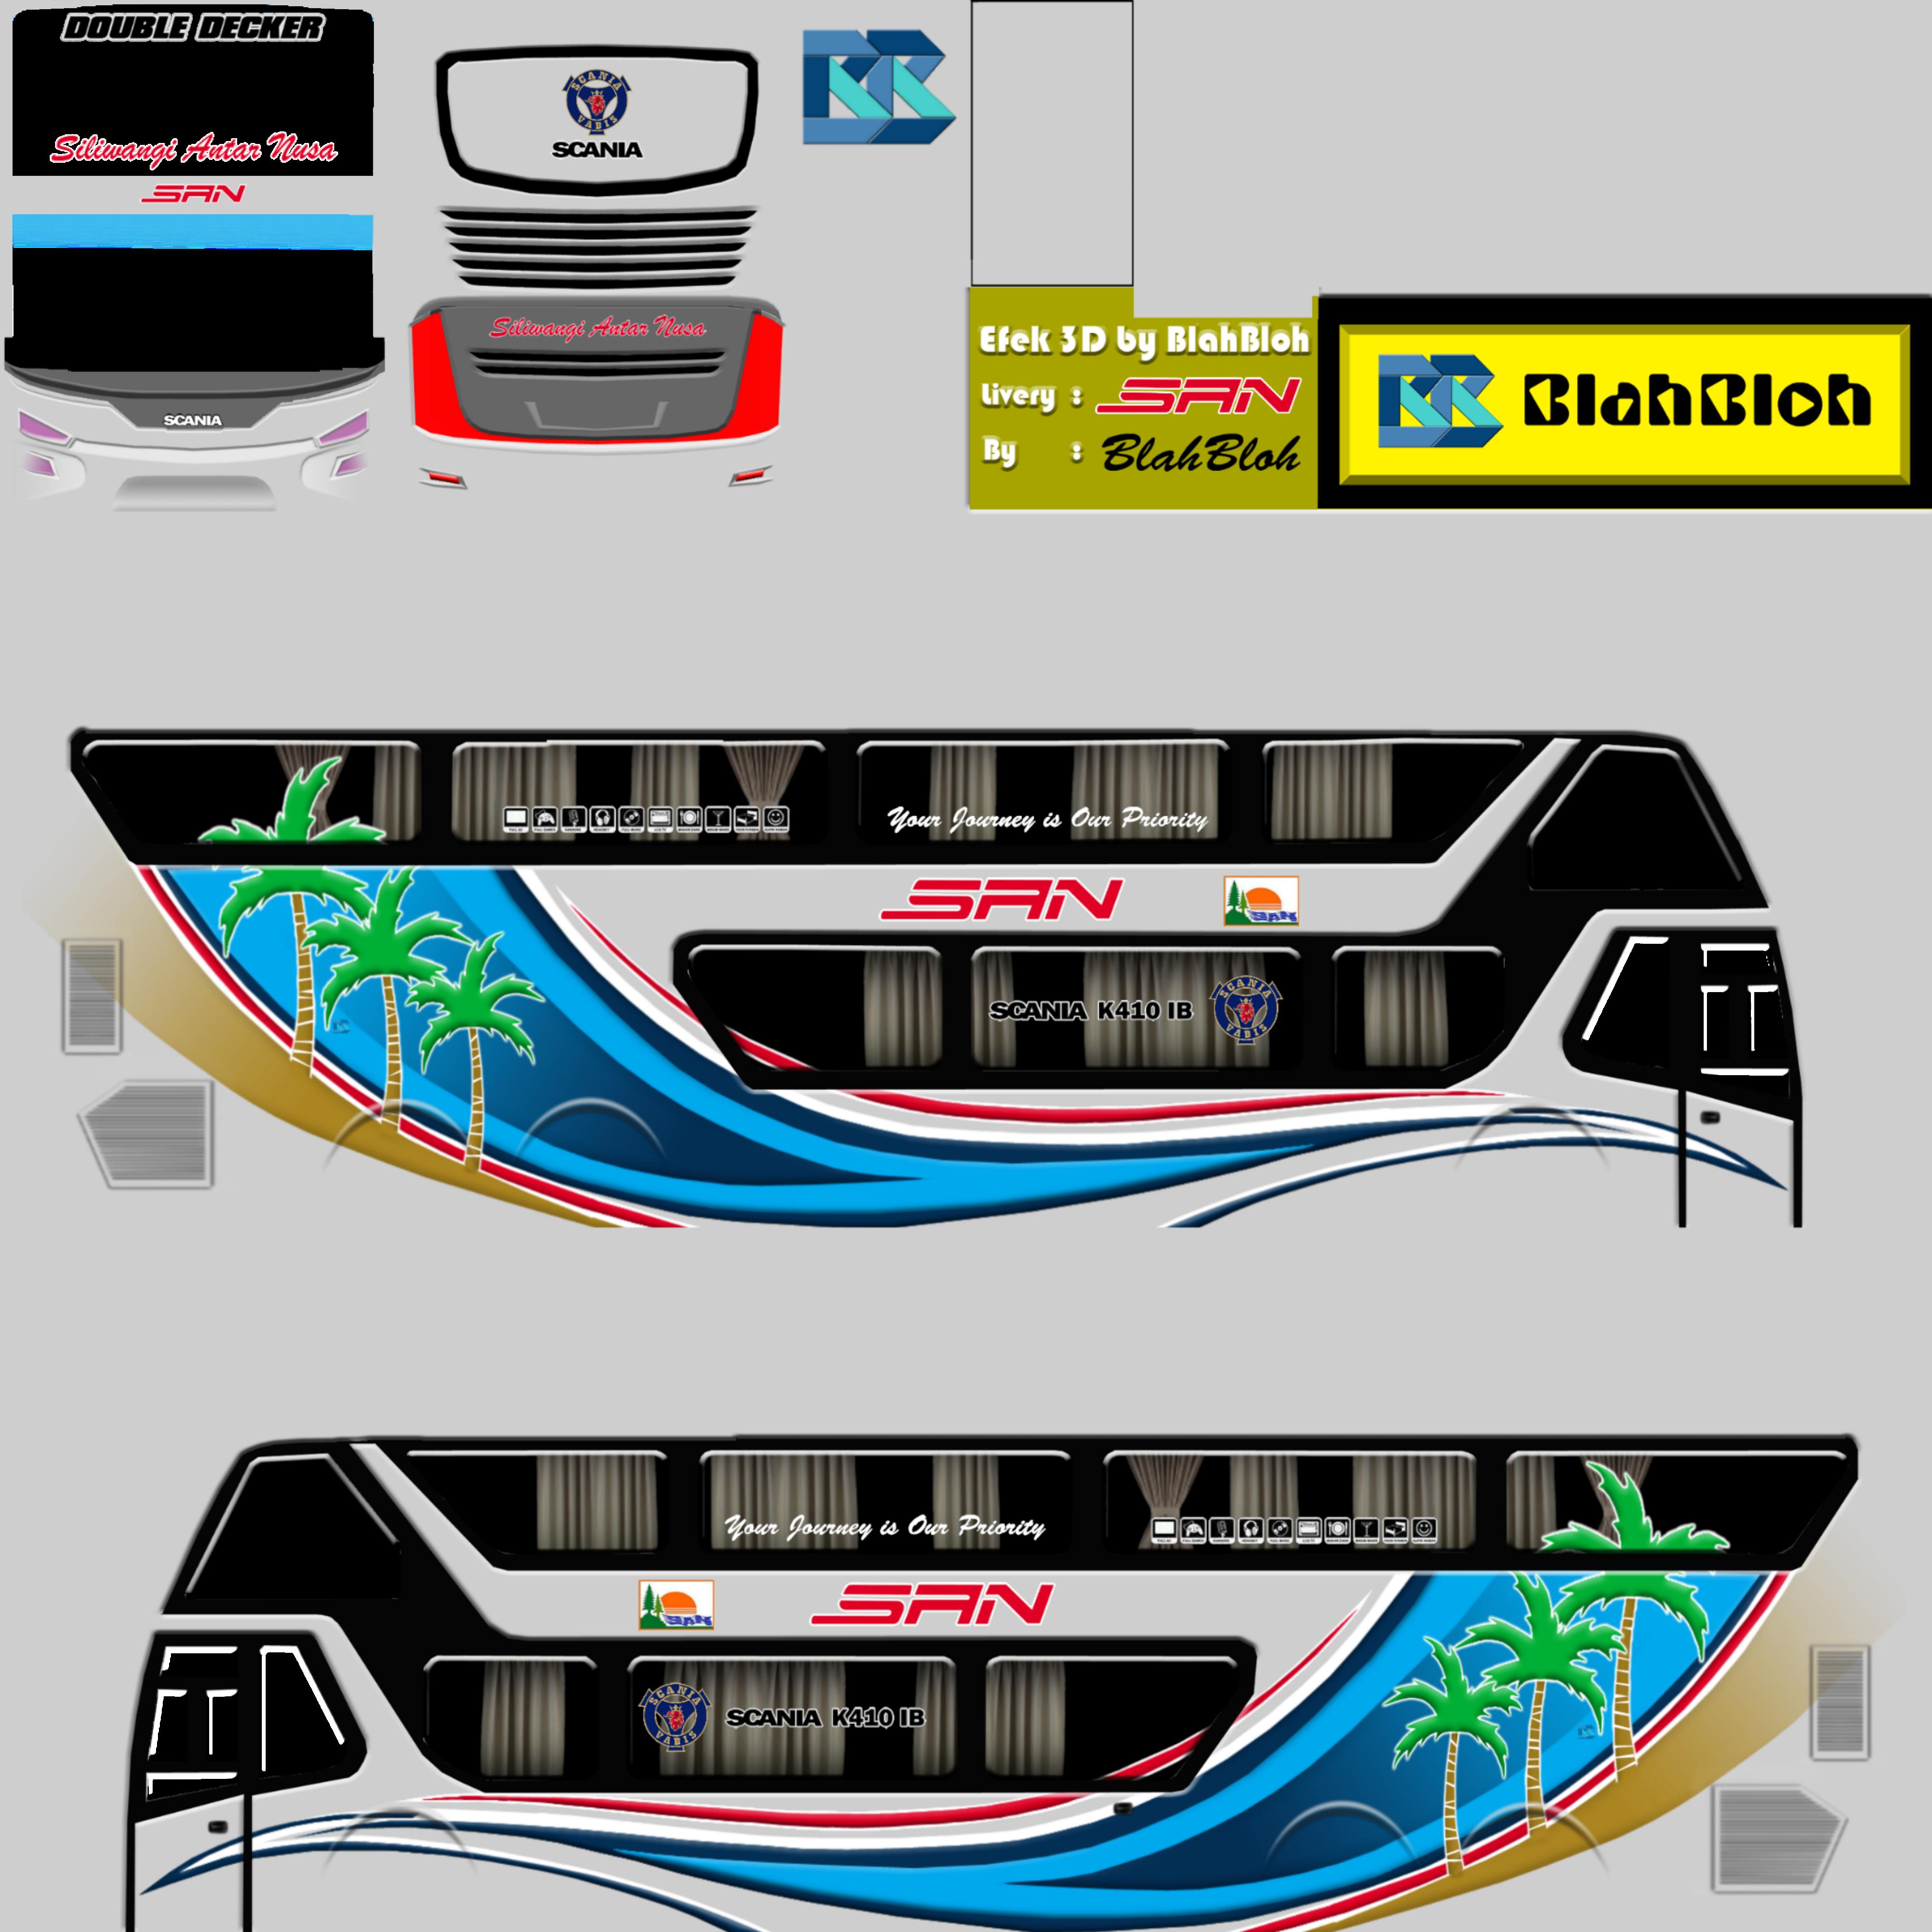 30 Livery Bussid Bimasena Sdd Terbaru Kualitas Jernih Png Konsep Mobil Mobil Modifikasi Mobil